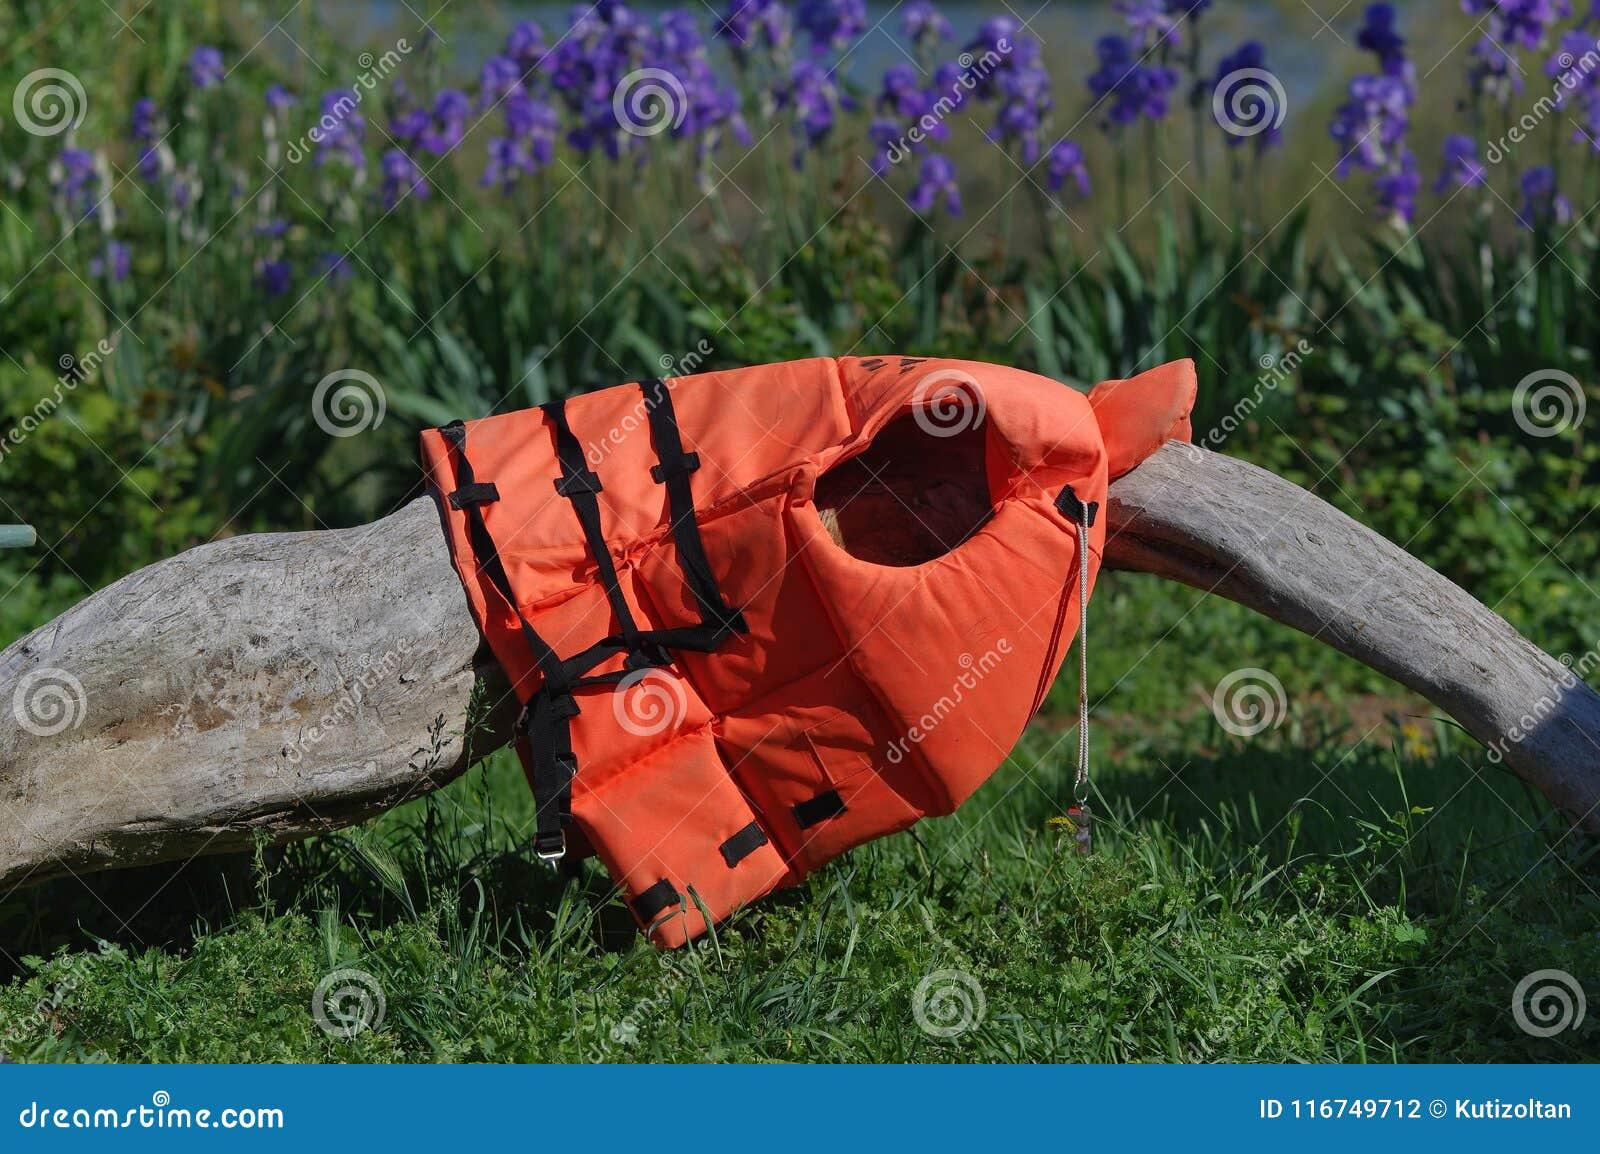 Orange life vest on the log